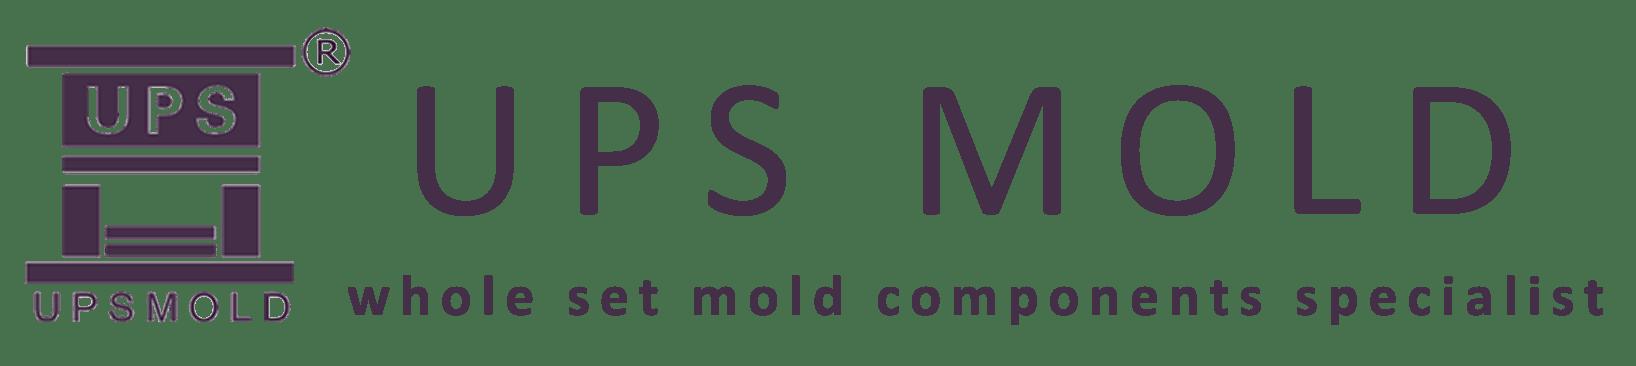 ups mold component processing